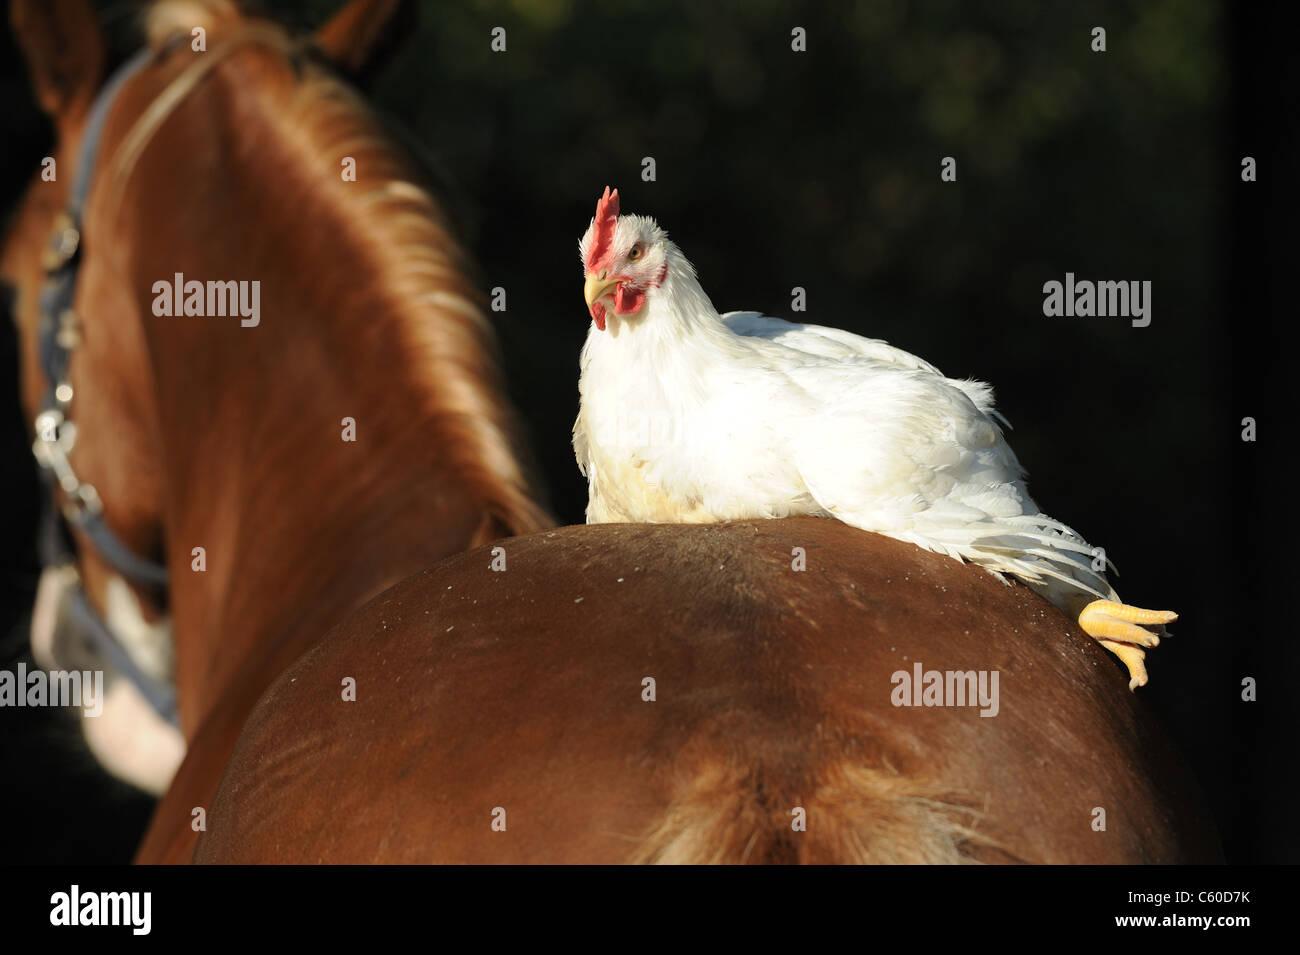 Haushuhn (Gallus Gallus Domesticus) ruht auf einem Welsh-Pony. Stockbild